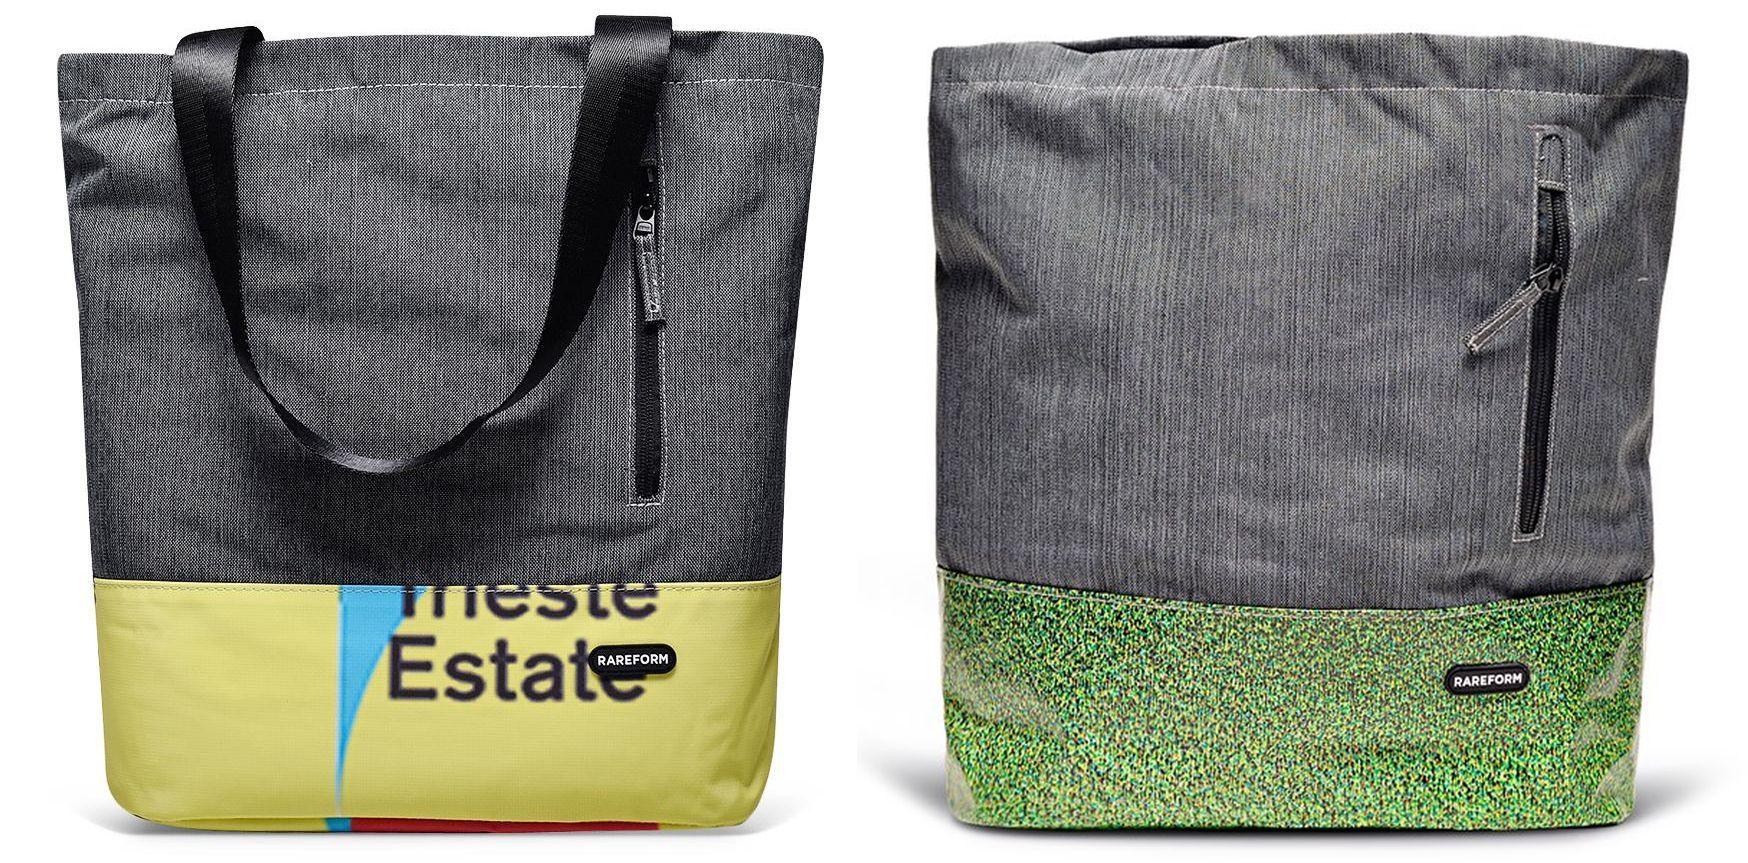 Rareform Classic Tote Bag